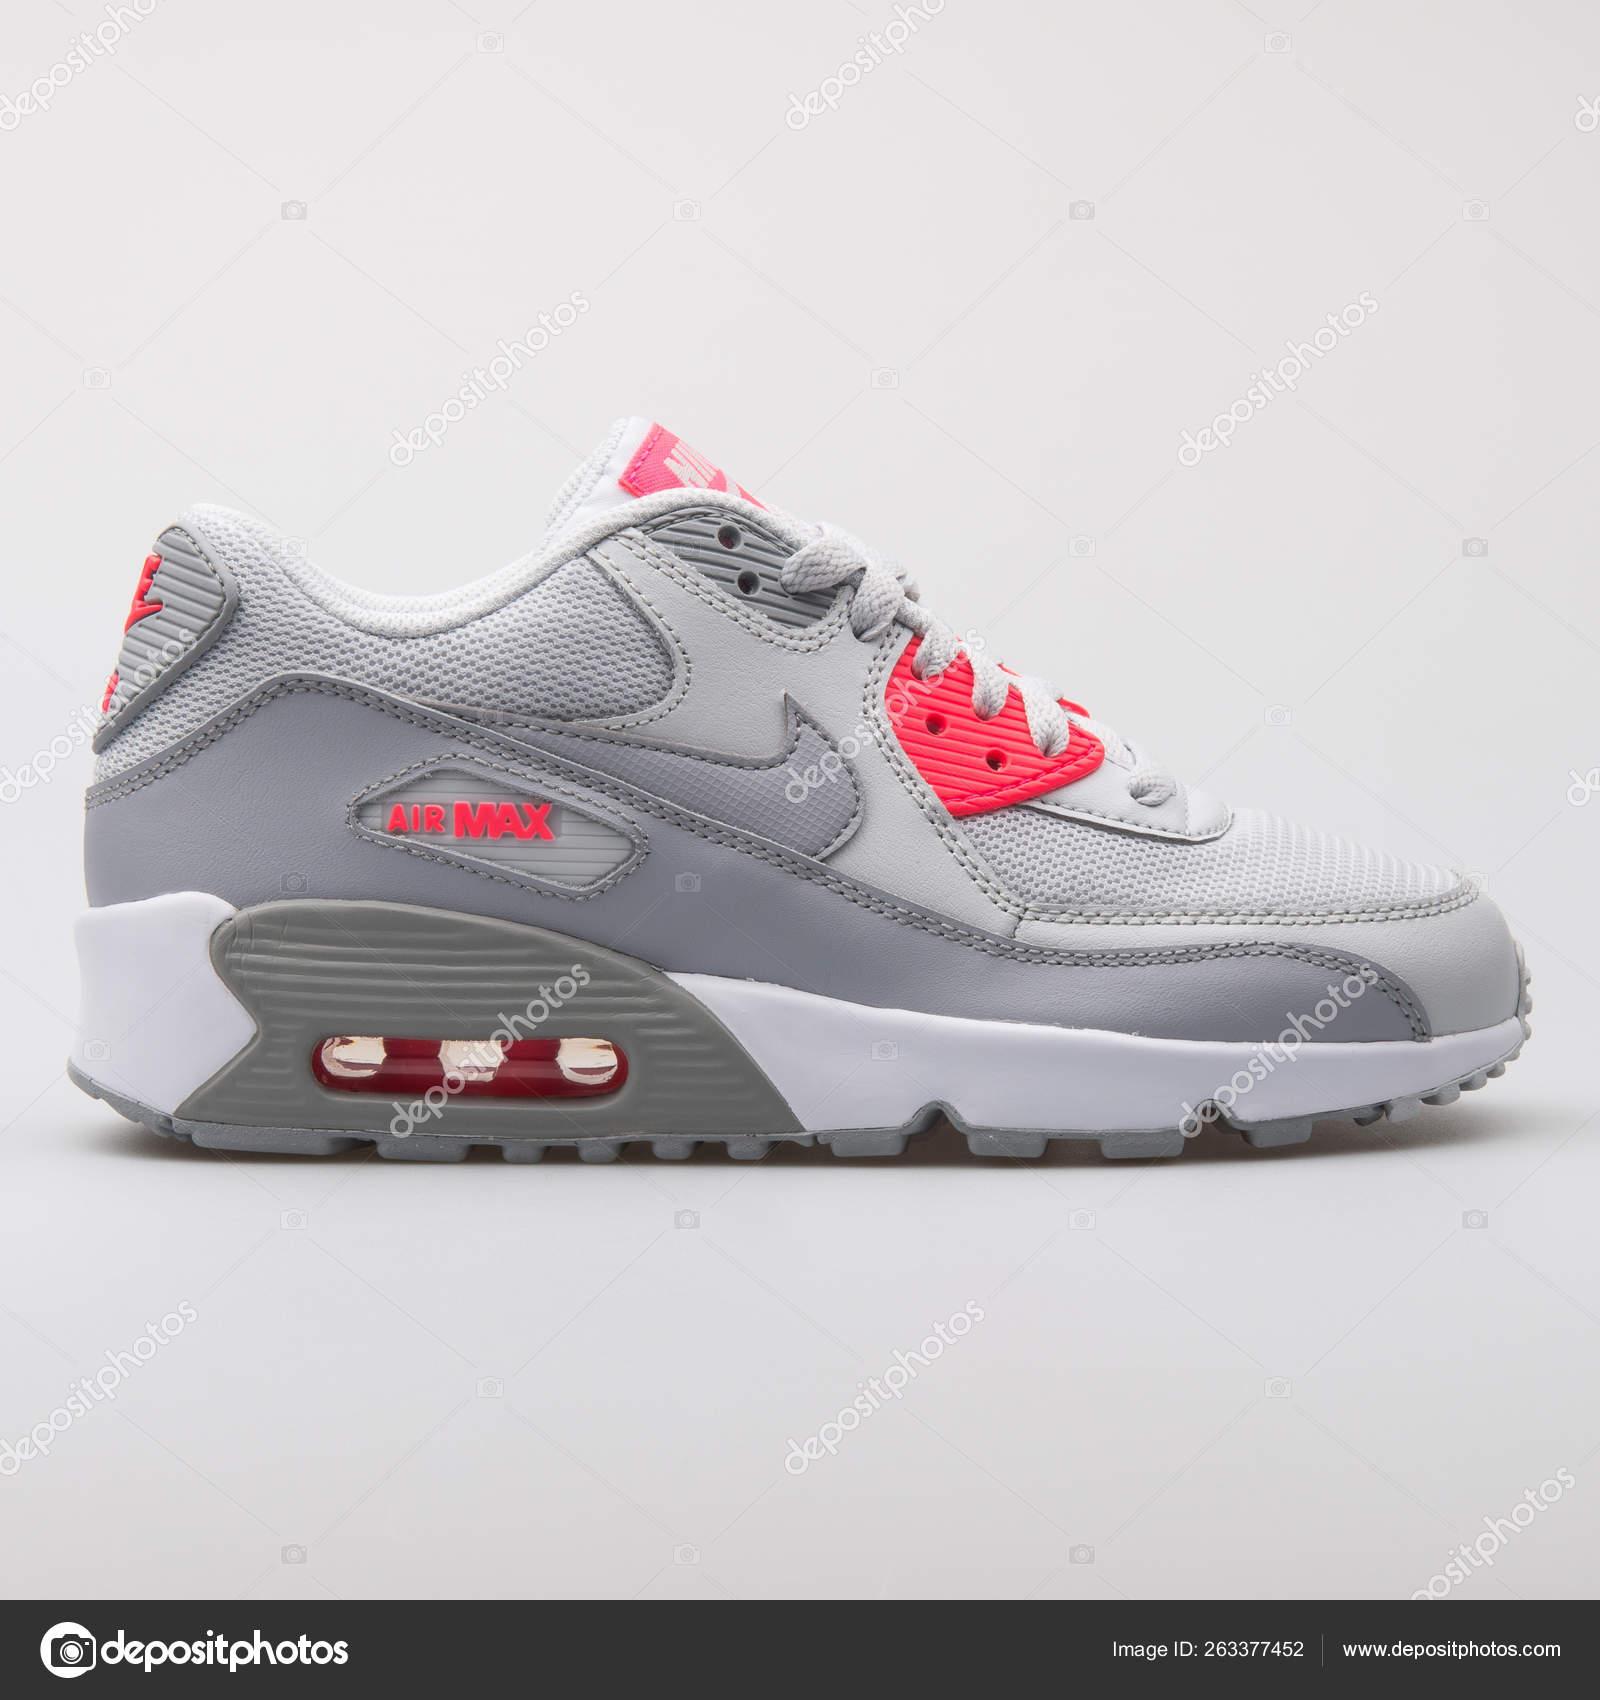 Nike Air Max 90 Mesh grey and pink sneaker – Stock Editorial